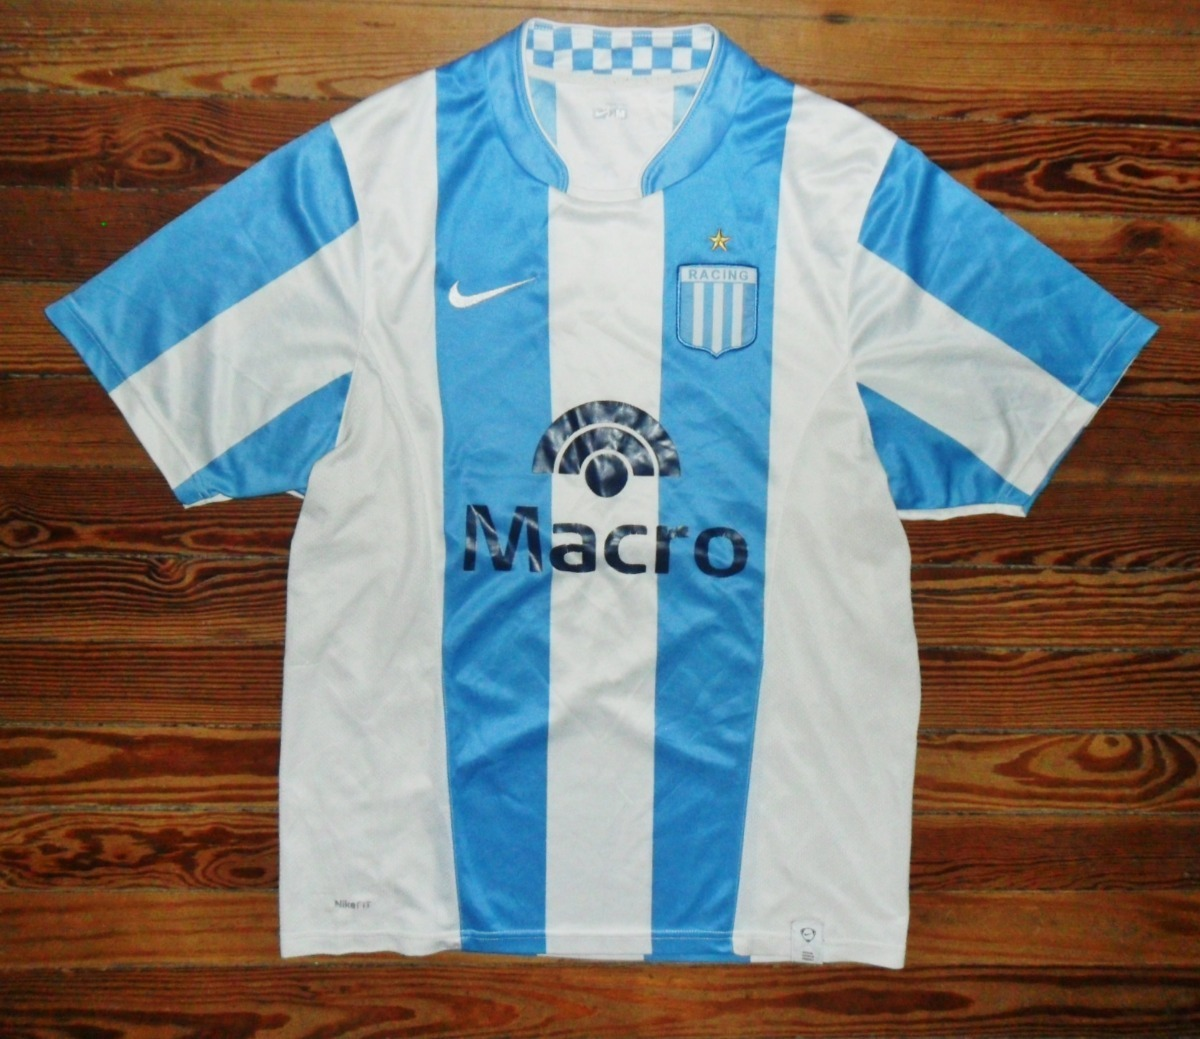 d5a8d0318c Camiseta Racing Club Nike * Casacas Clásicas * - $ 1.500,00 en ...